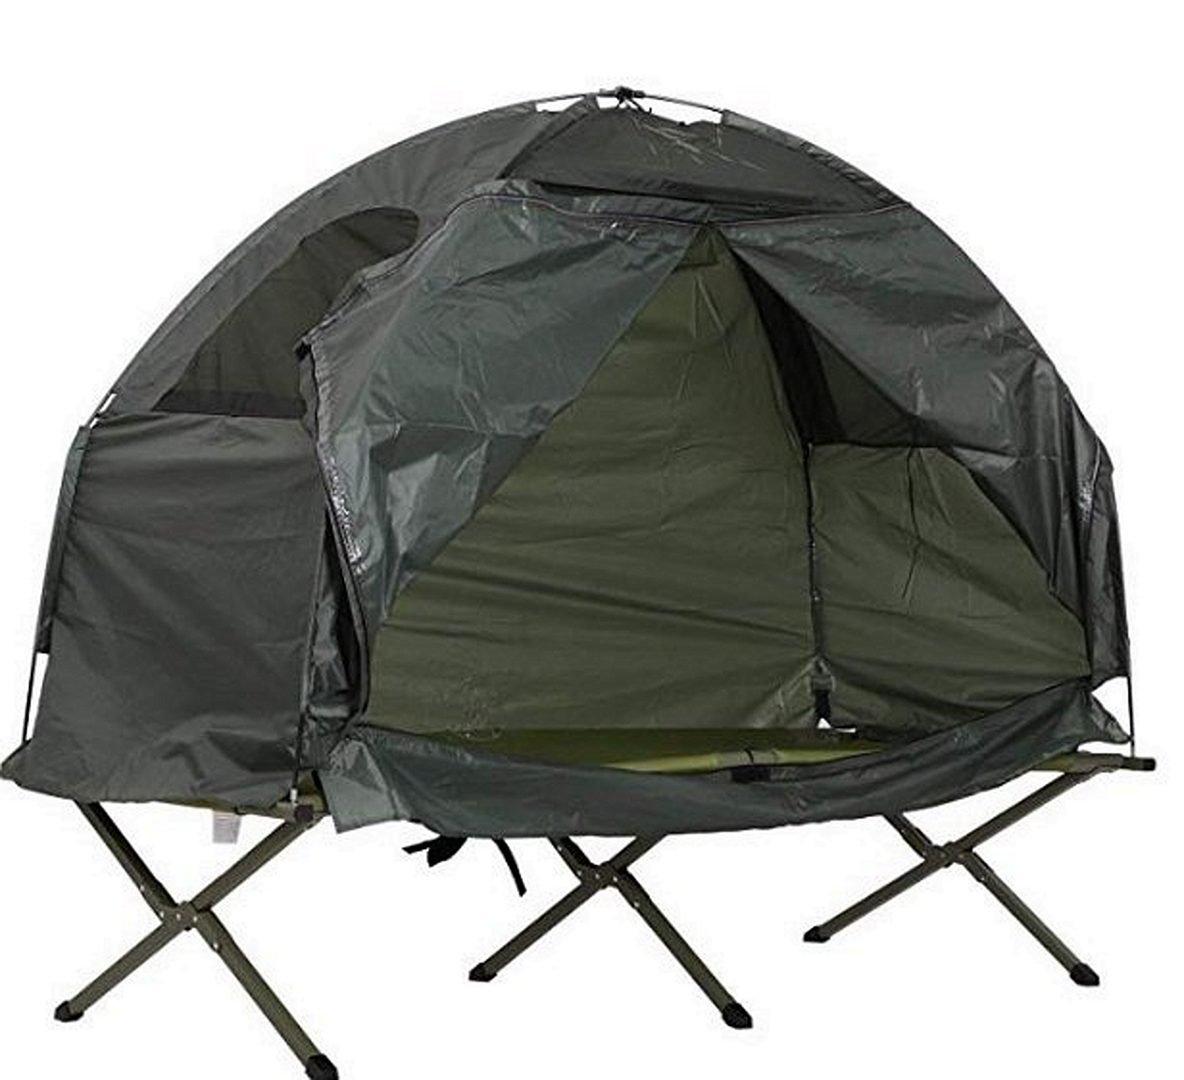 Tidyard Pop Up Folding Tent Cot